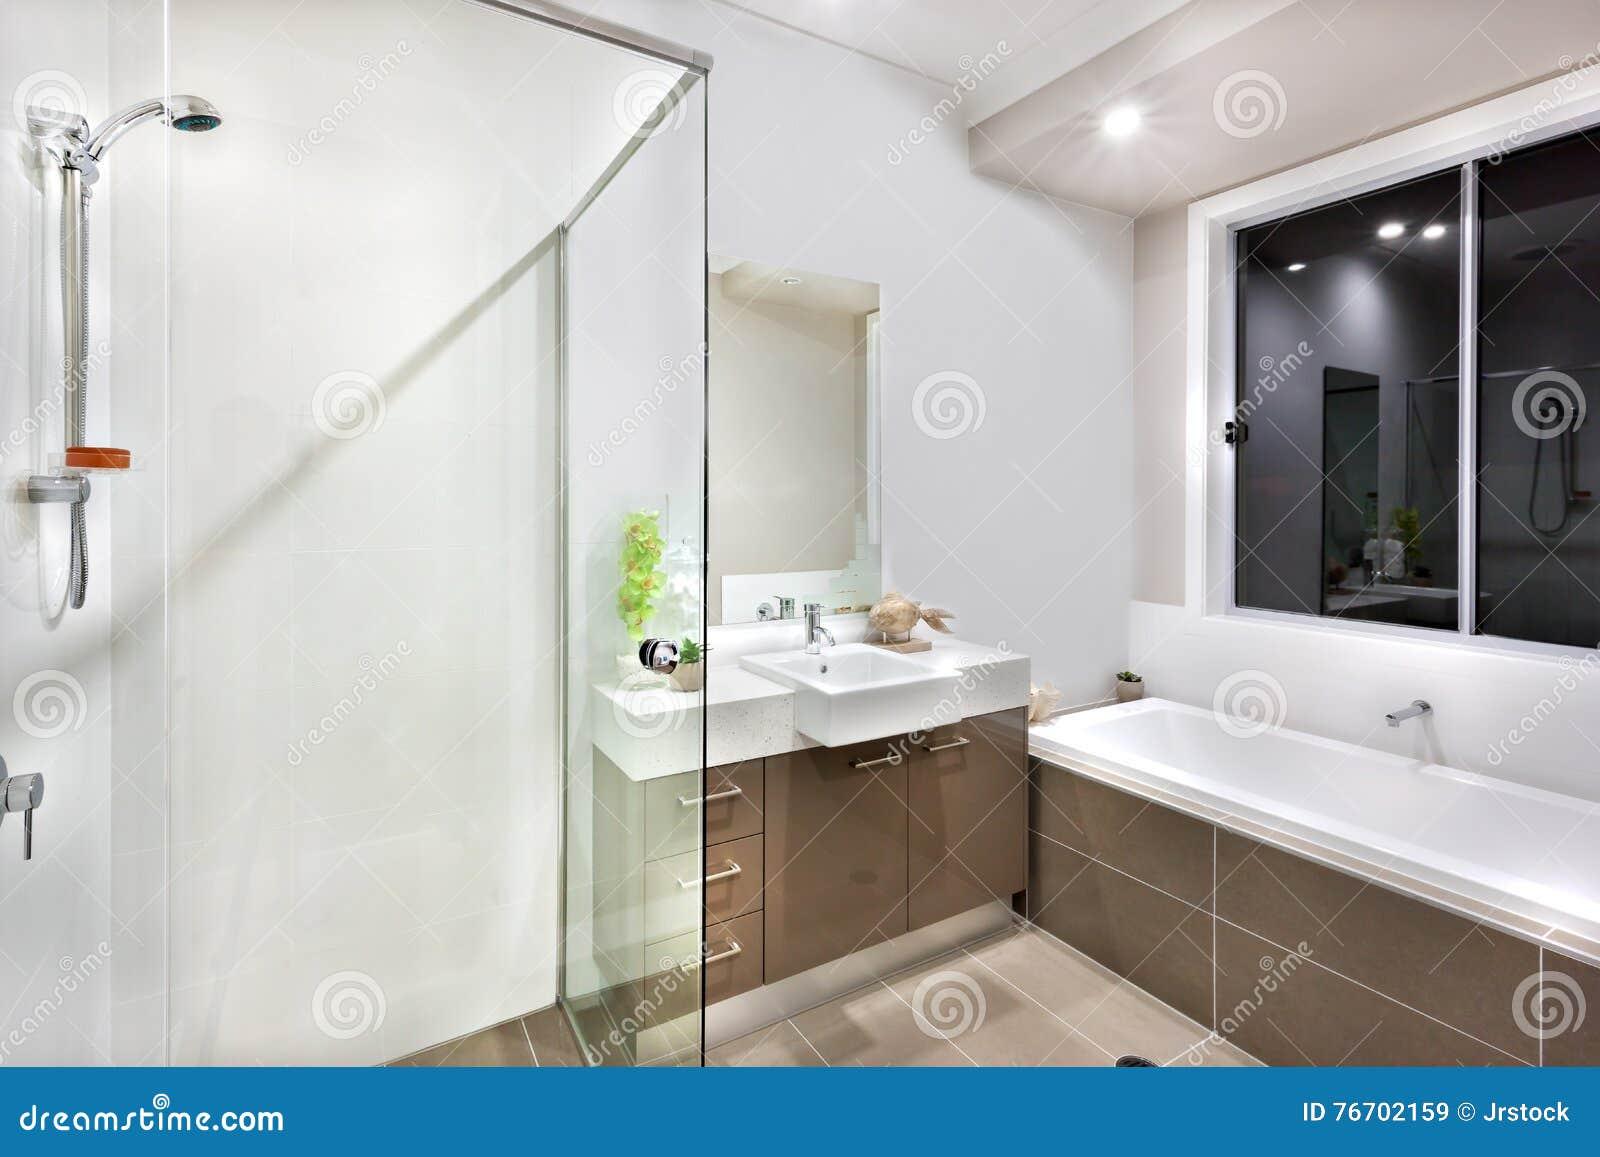 New Bathroom With Washing Area, Including Bath Tub Stock Image ...